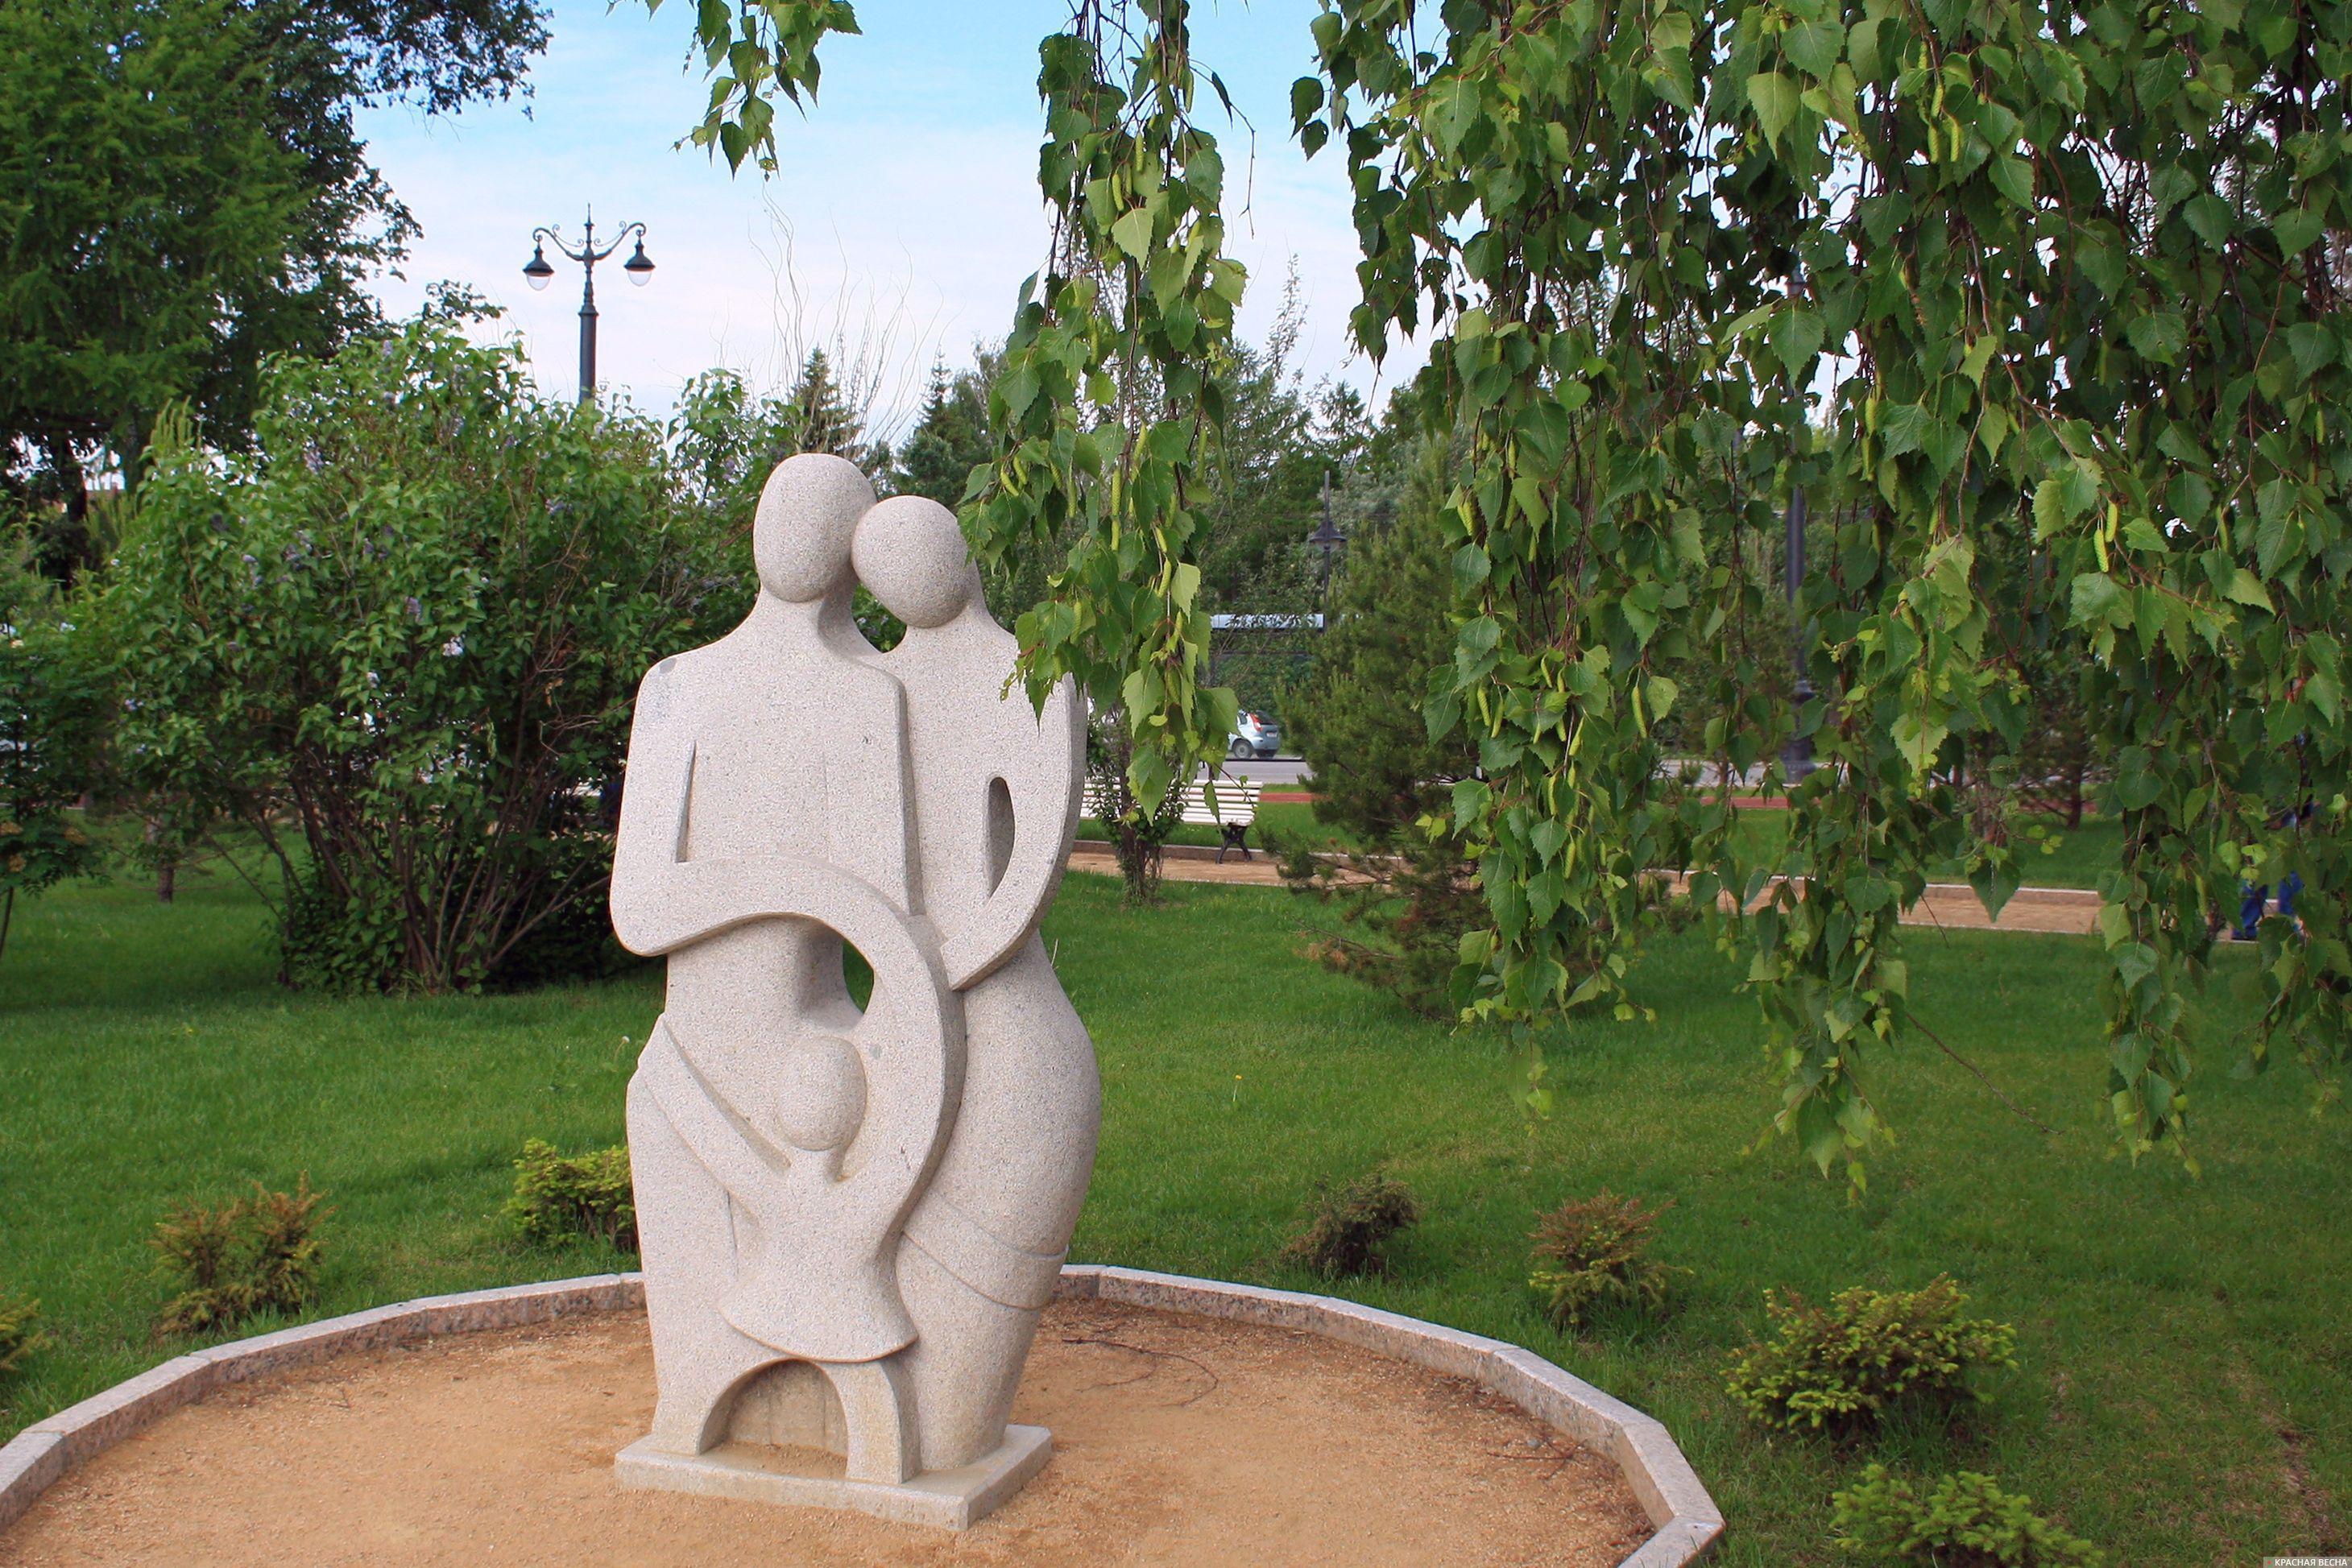 Семья. Композиция из камня. Анна Рыжкова © ИА Красная Весна